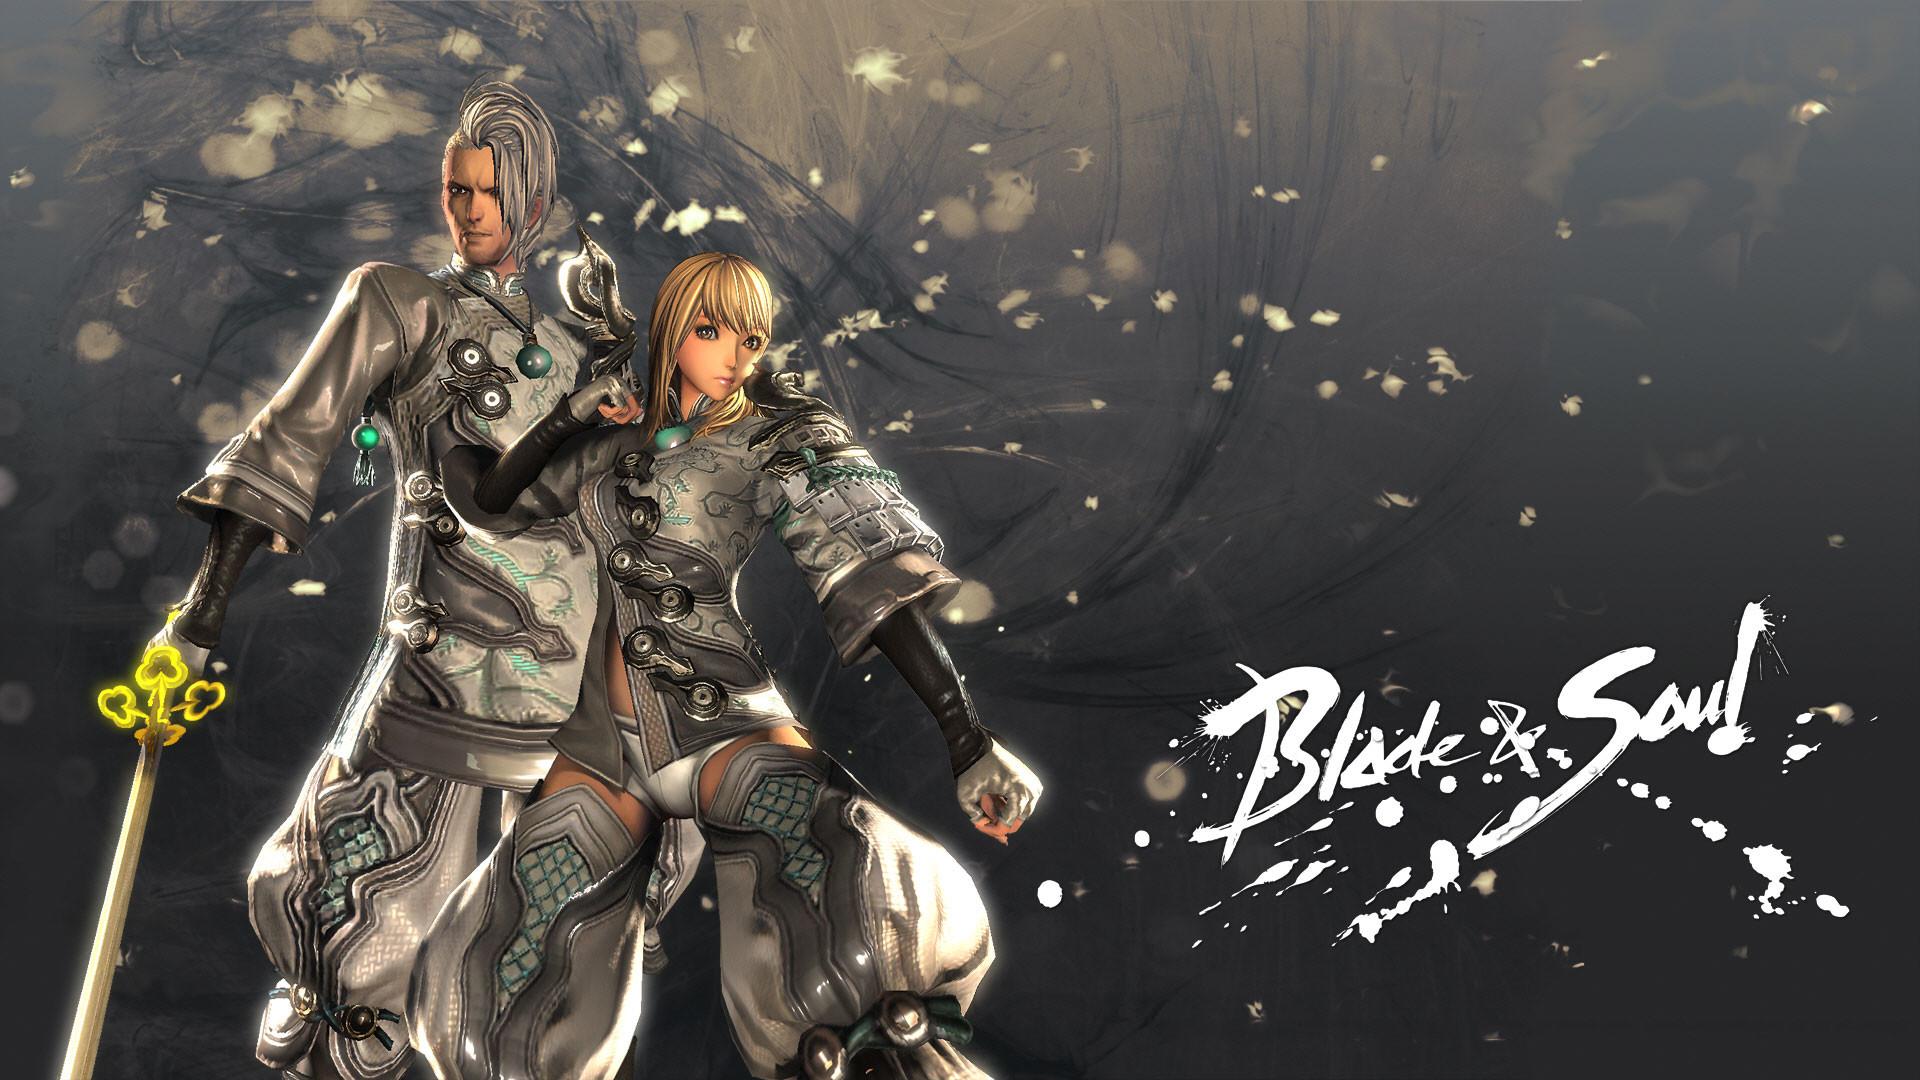 … Blade & Soul 1080p Wallpaper …